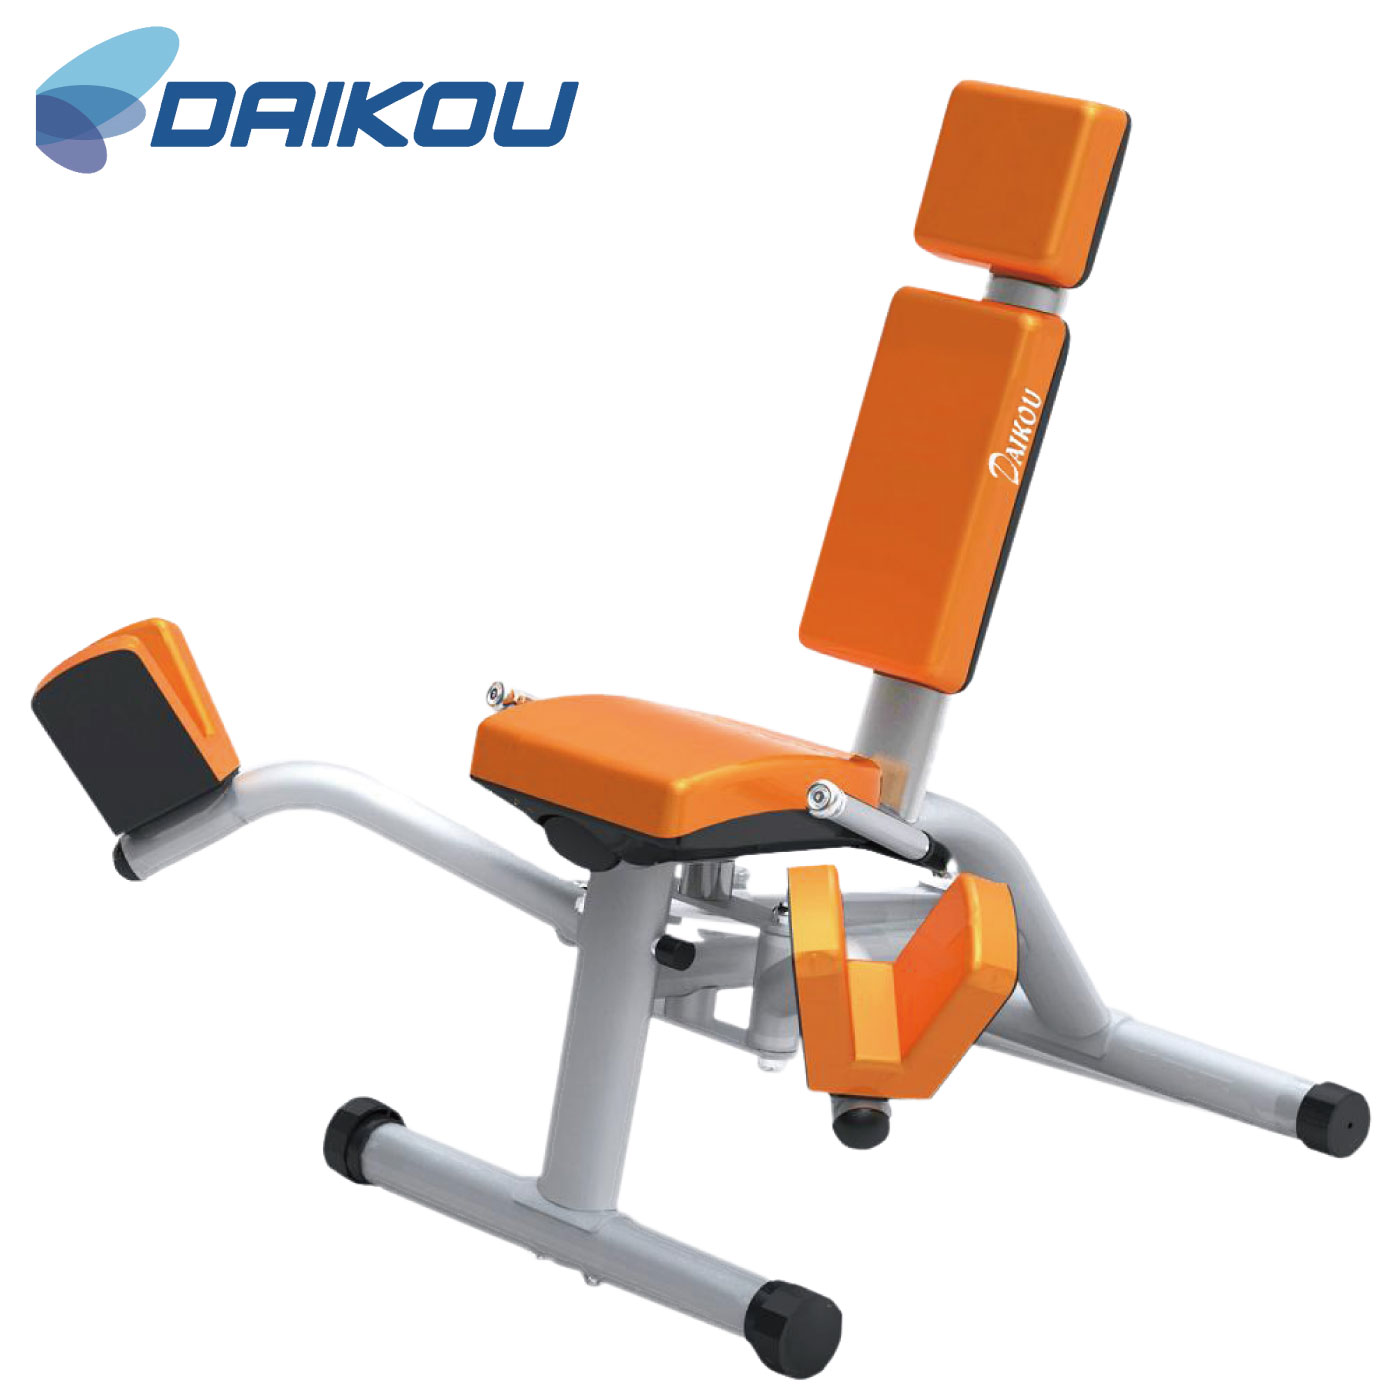 DK-1204(ヒップアブダクション・アダクション)/準業務用油圧マシン《DAIKOU(ダイコー)》